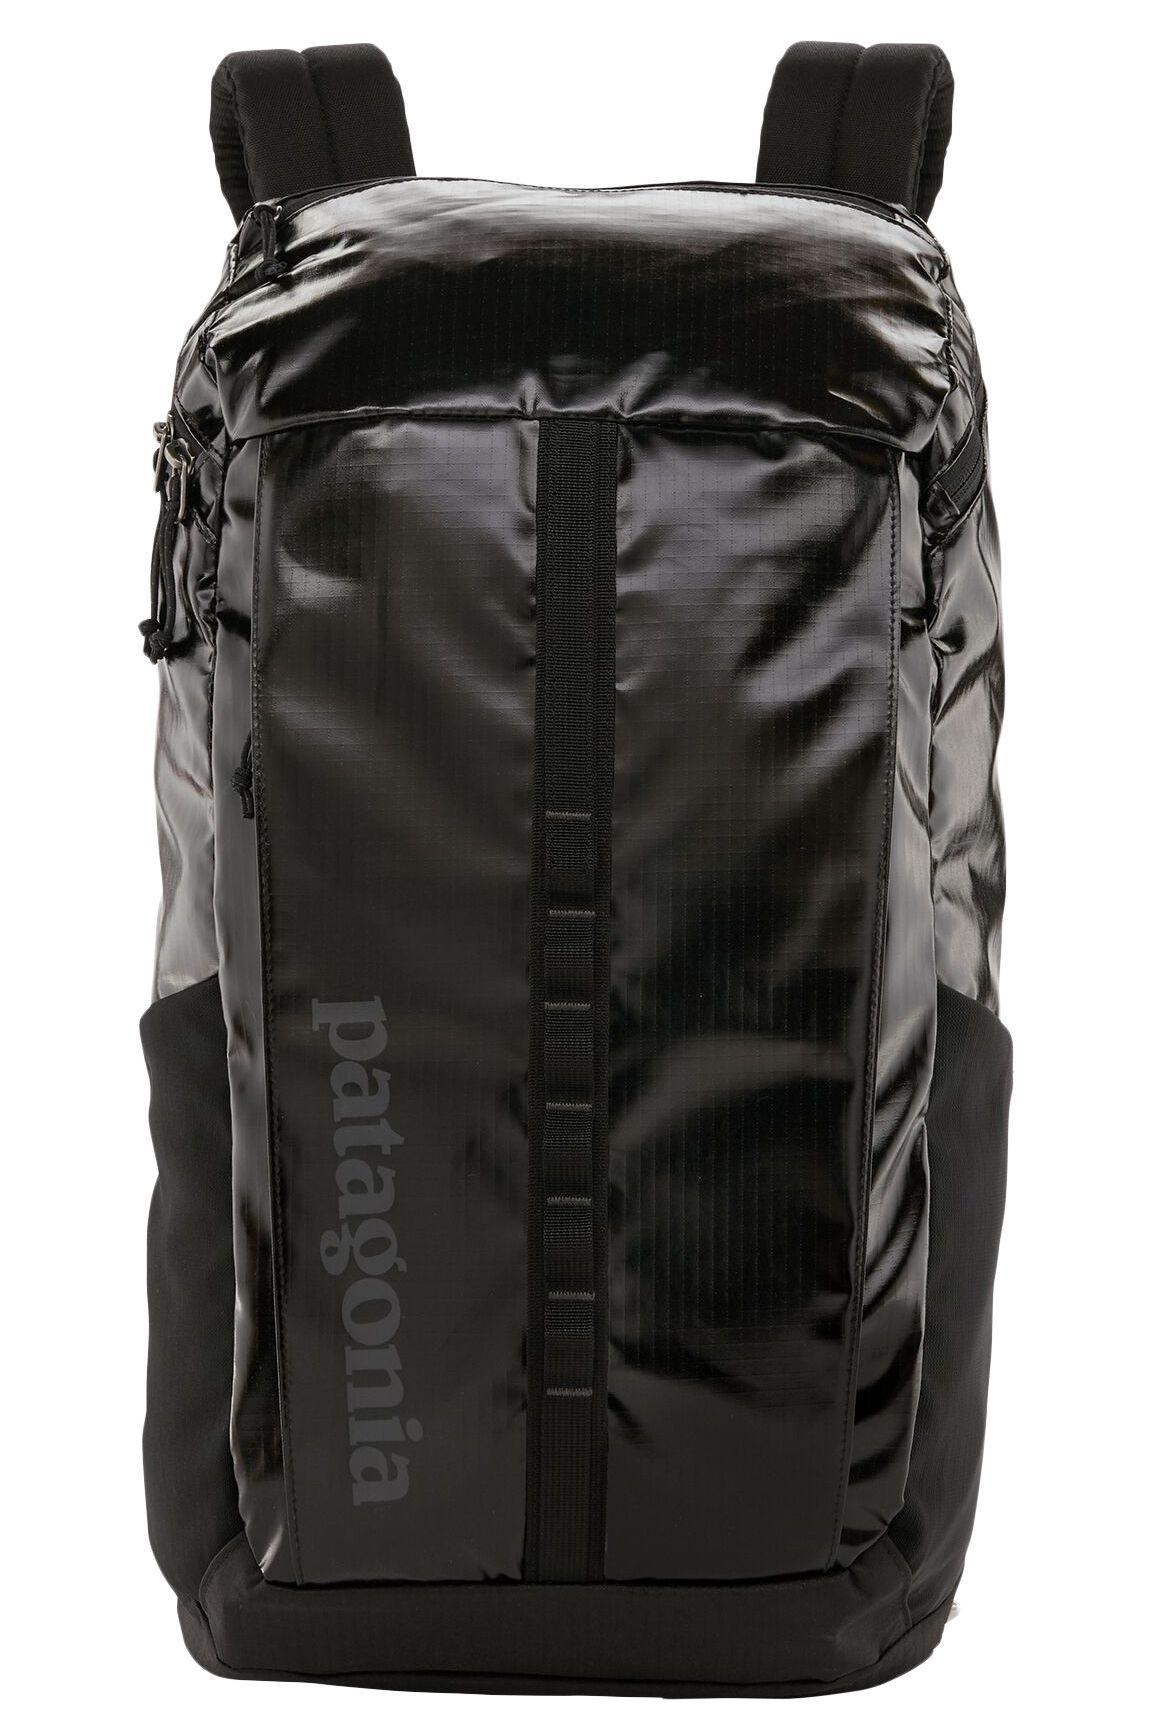 Patagonia Backpack BLACK HOLE PACK 25L Black